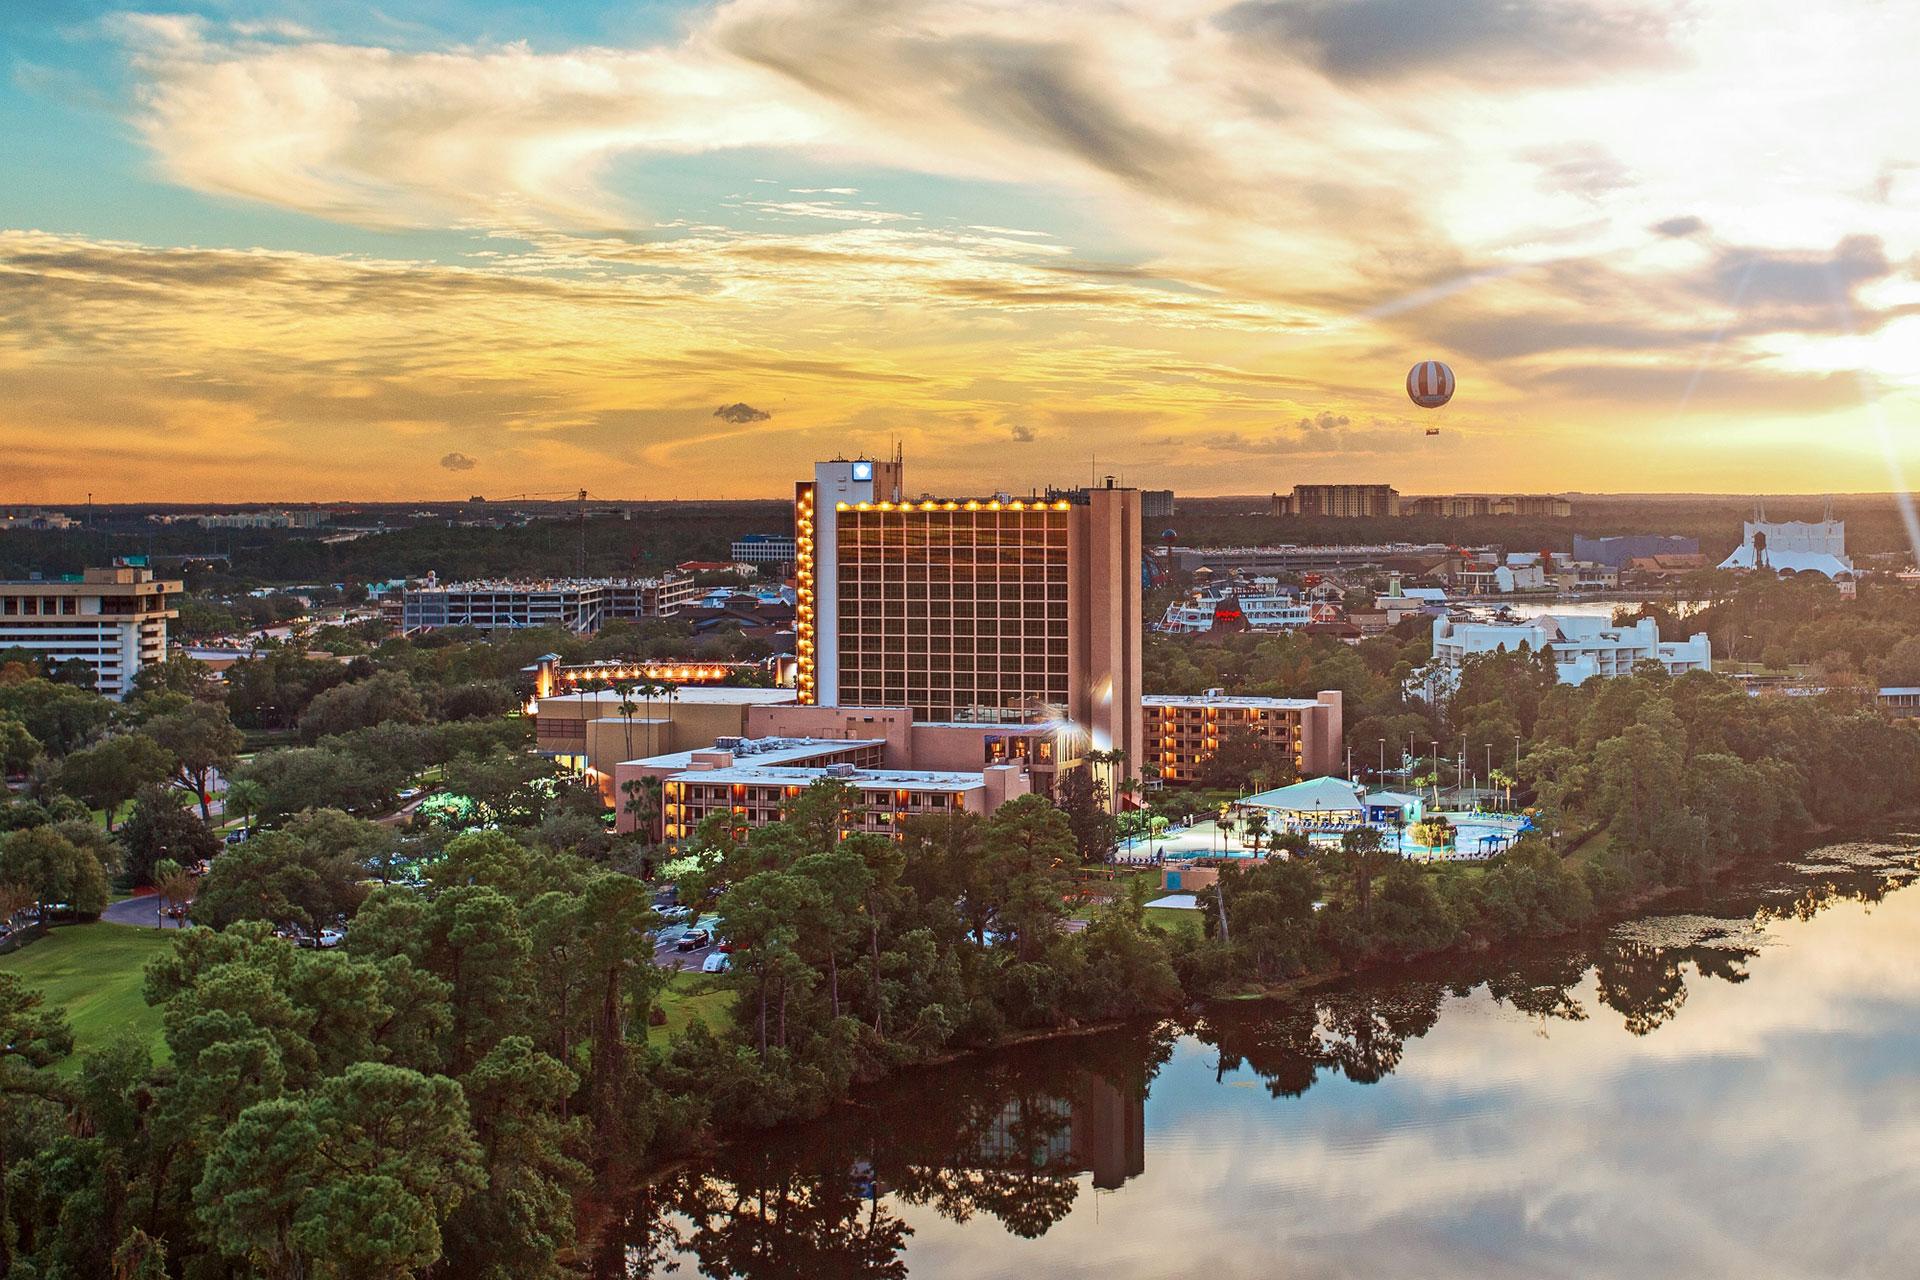 Aerial View of Wyndham Lake Buena Vista Disney Springs Resort Area; Courtesy of Wyndham Lake Buena Vista Disney Springs Resort Area